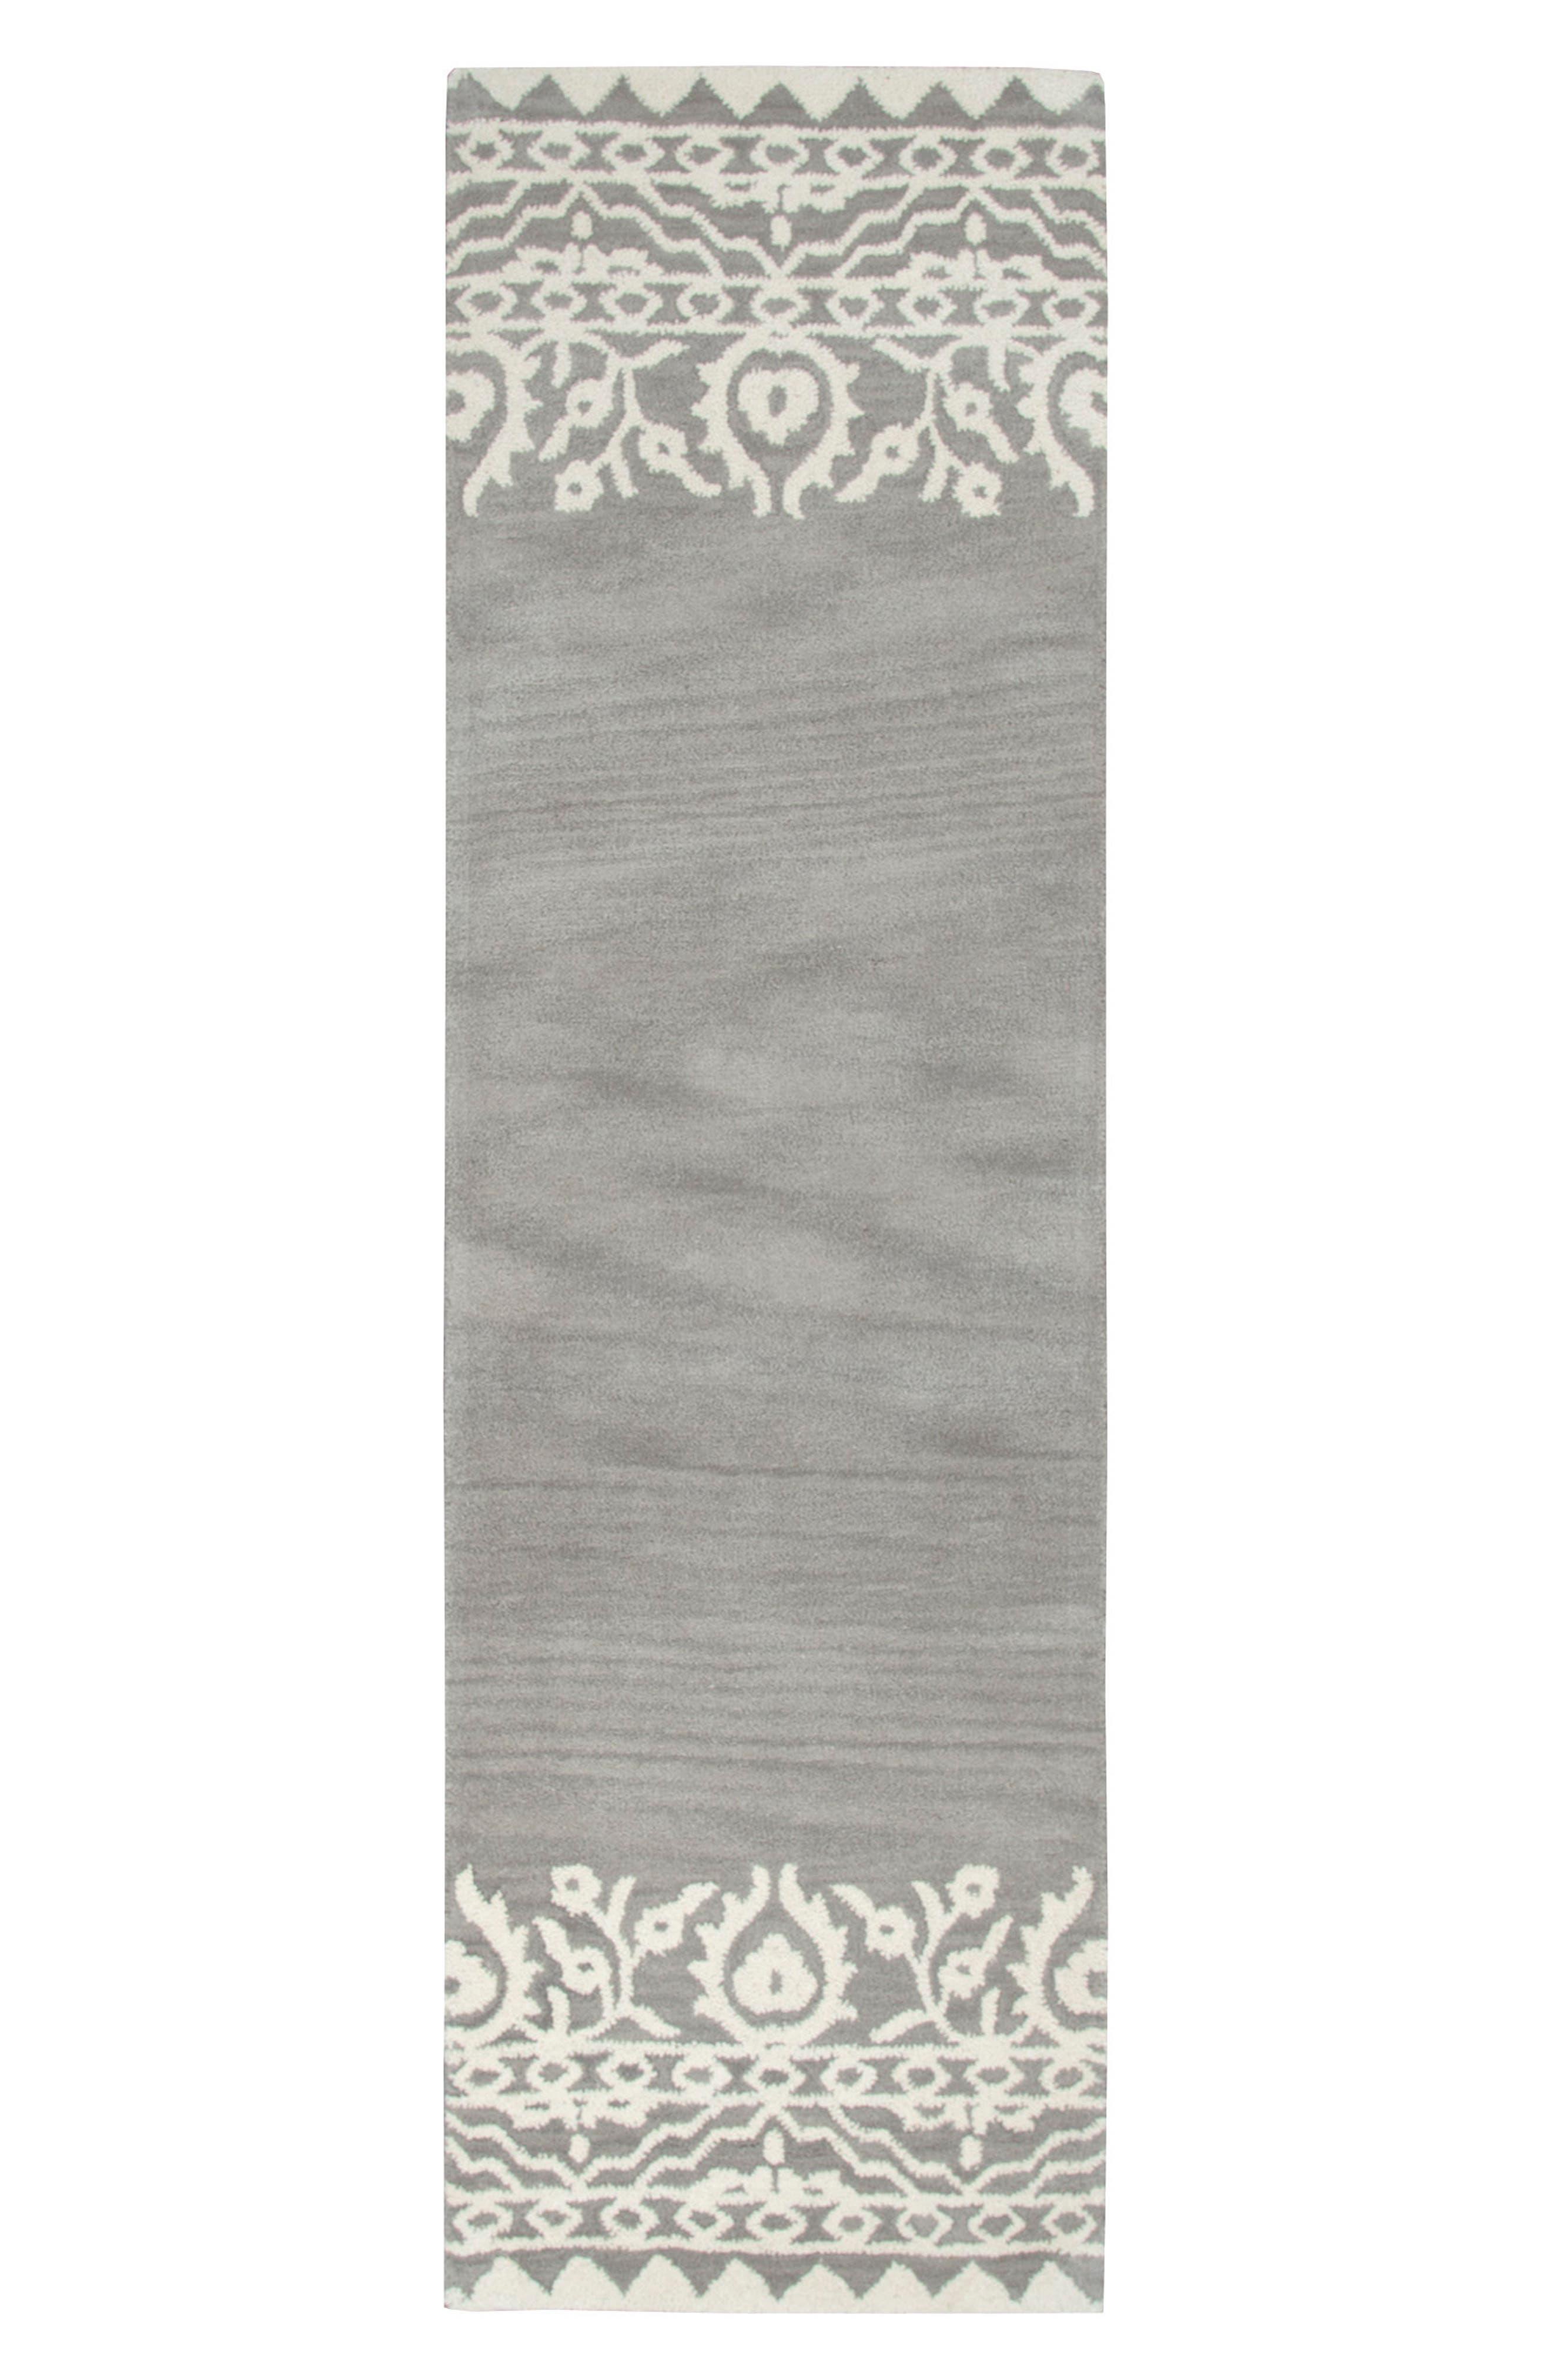 Framed Medallion Hand Tufted Wool Area Rug,                             Alternate thumbnail 14, color,